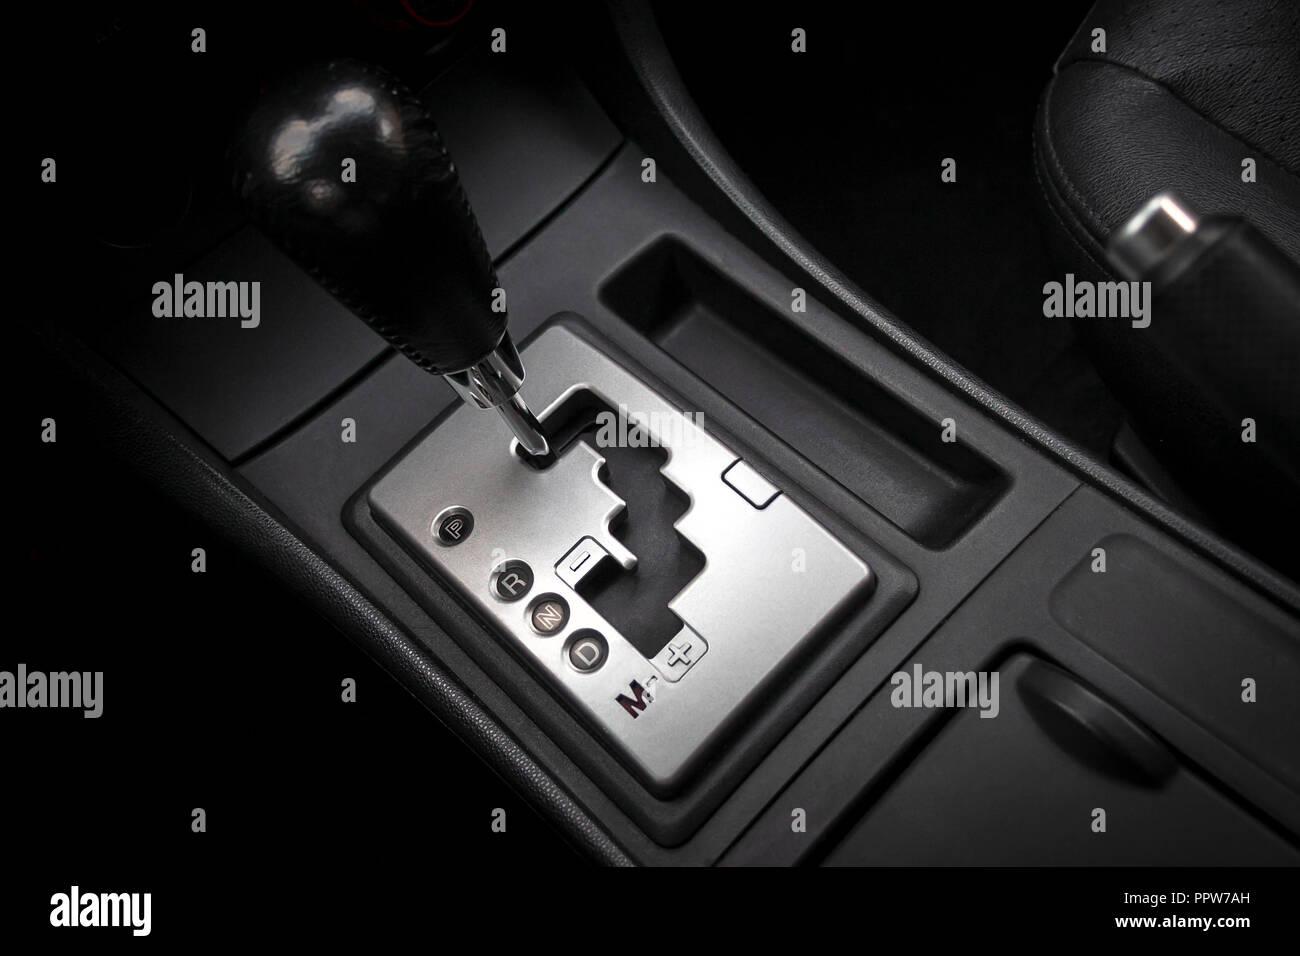 Car interior with semi-automatic transmission gear knob